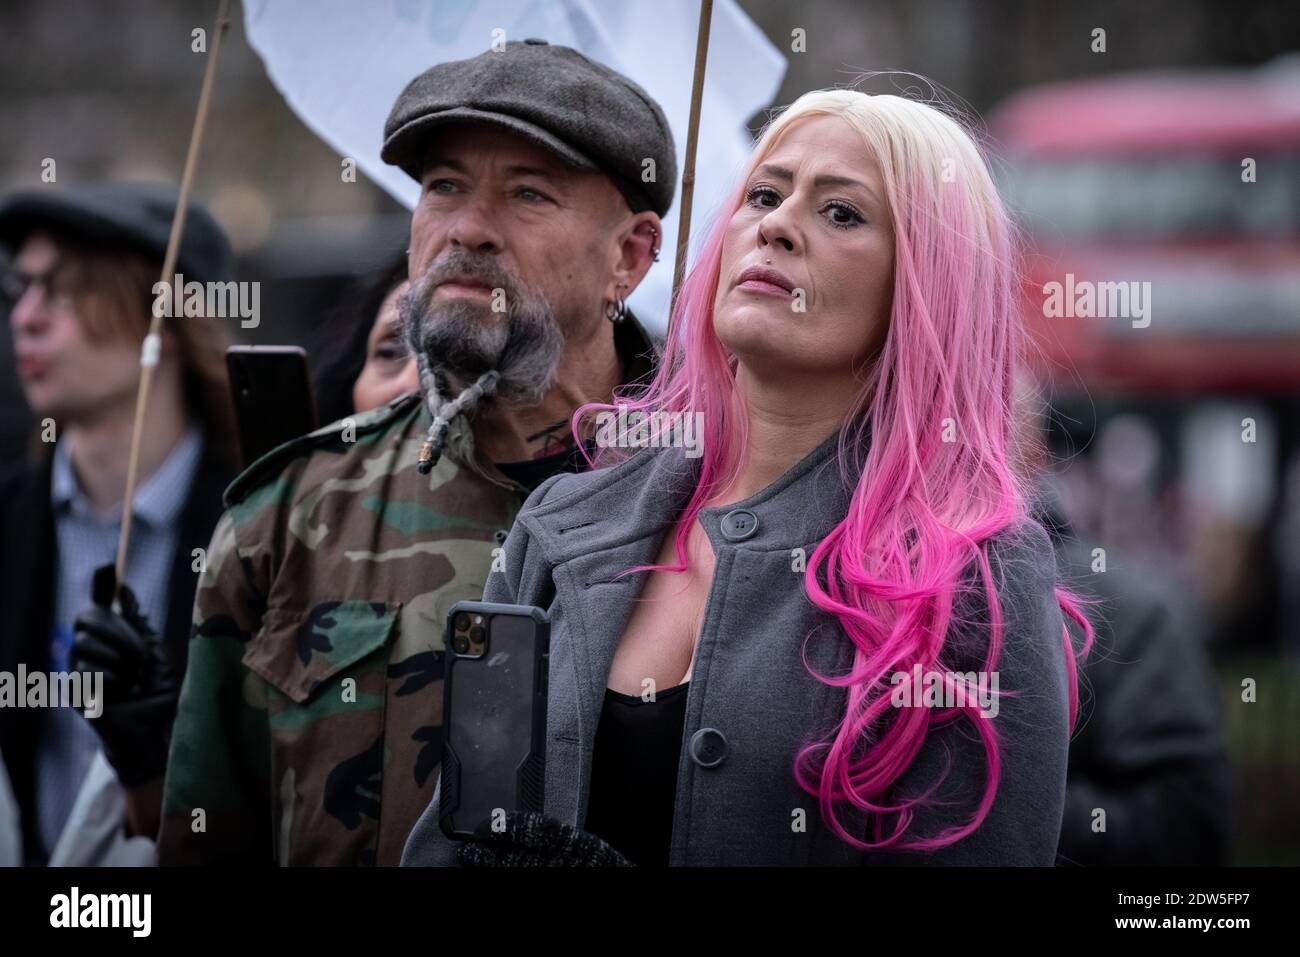 Martin Hockridge(left) with Lisa Jane Waters(right). Coronavirus: Anti-lockdown 'Santa Saves Xmas' protest at Speakers' Corner, Hyde Park, London. Stock Photo